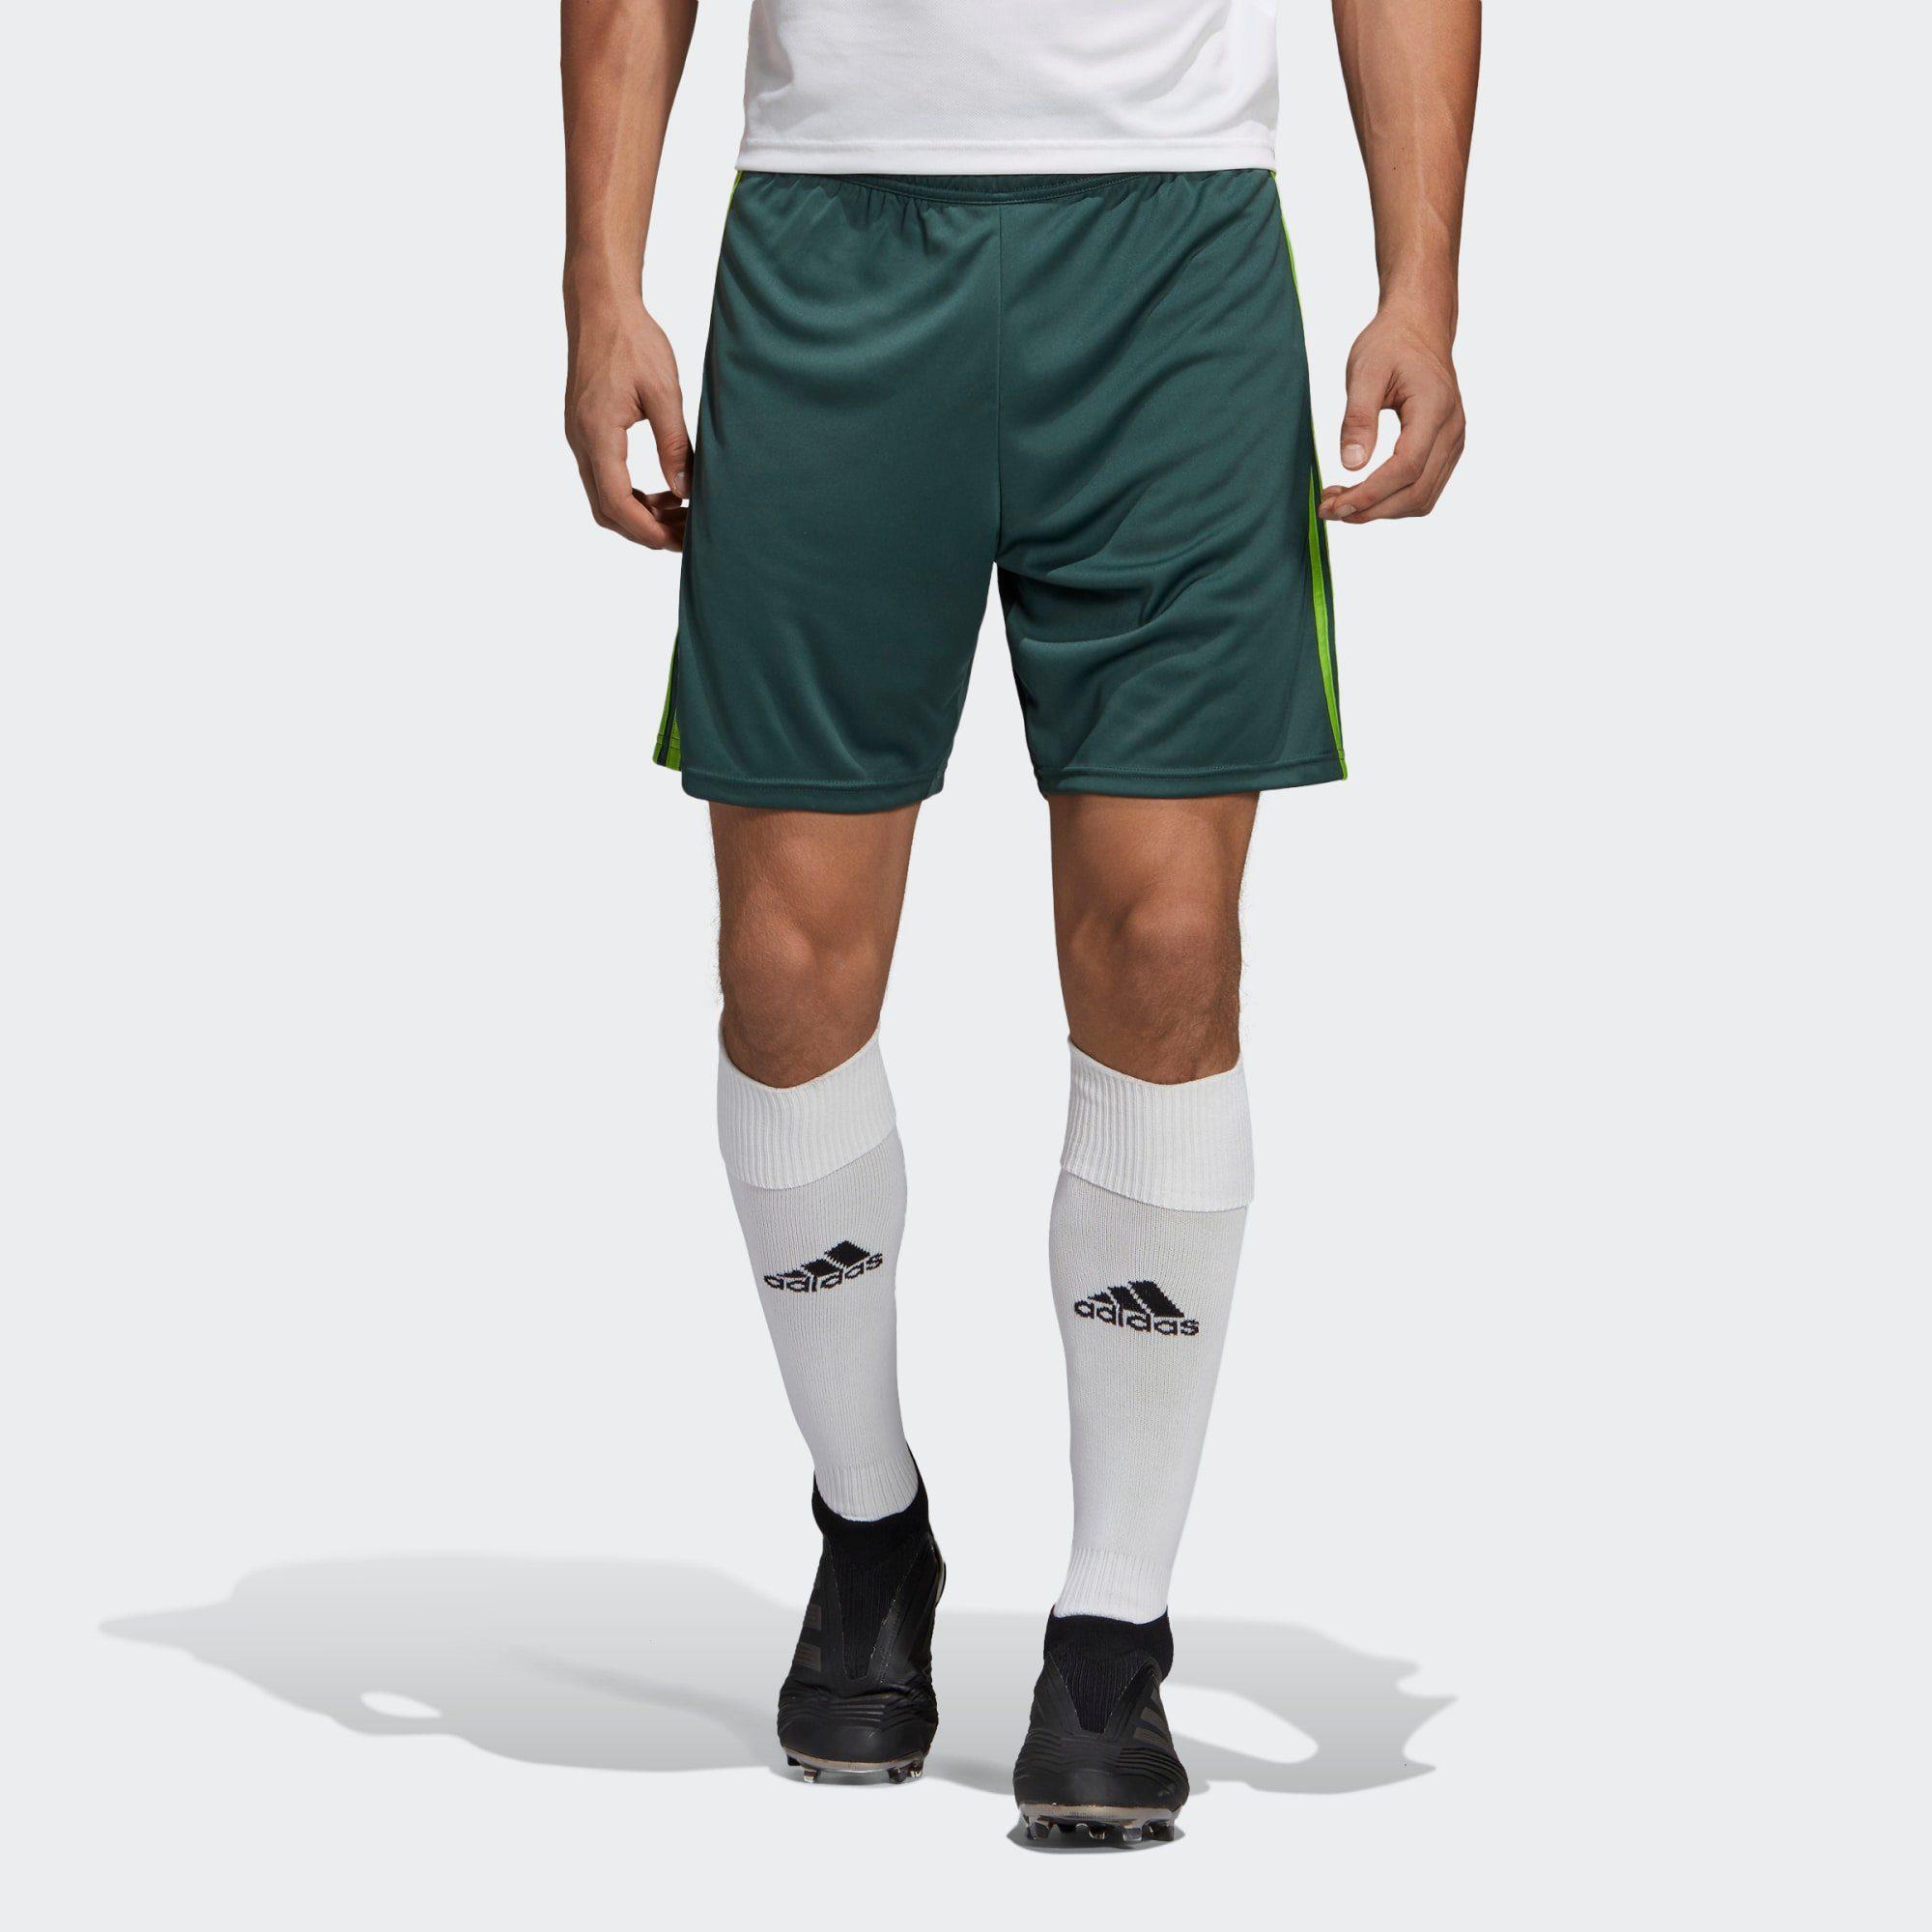 Shorts & Hosen adidas Herren Juventus Turin Heim Shorts